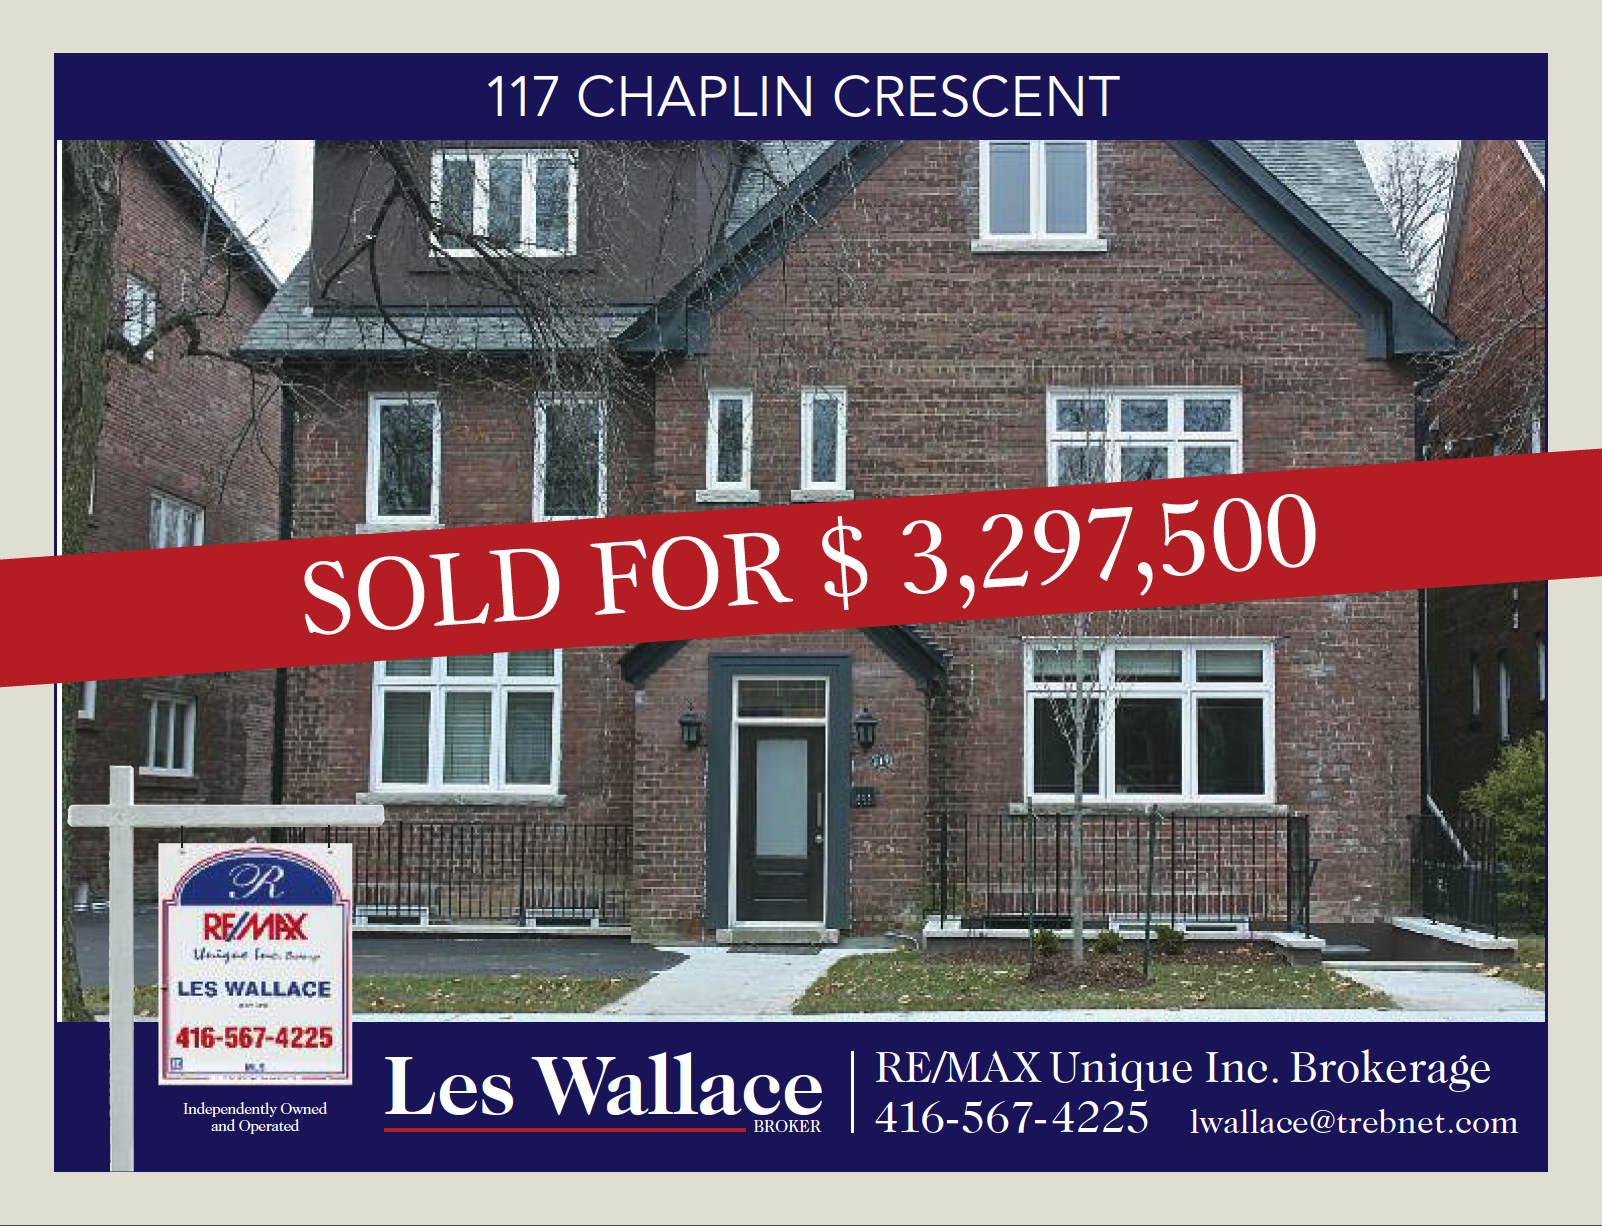 117 Chaplin Crescent